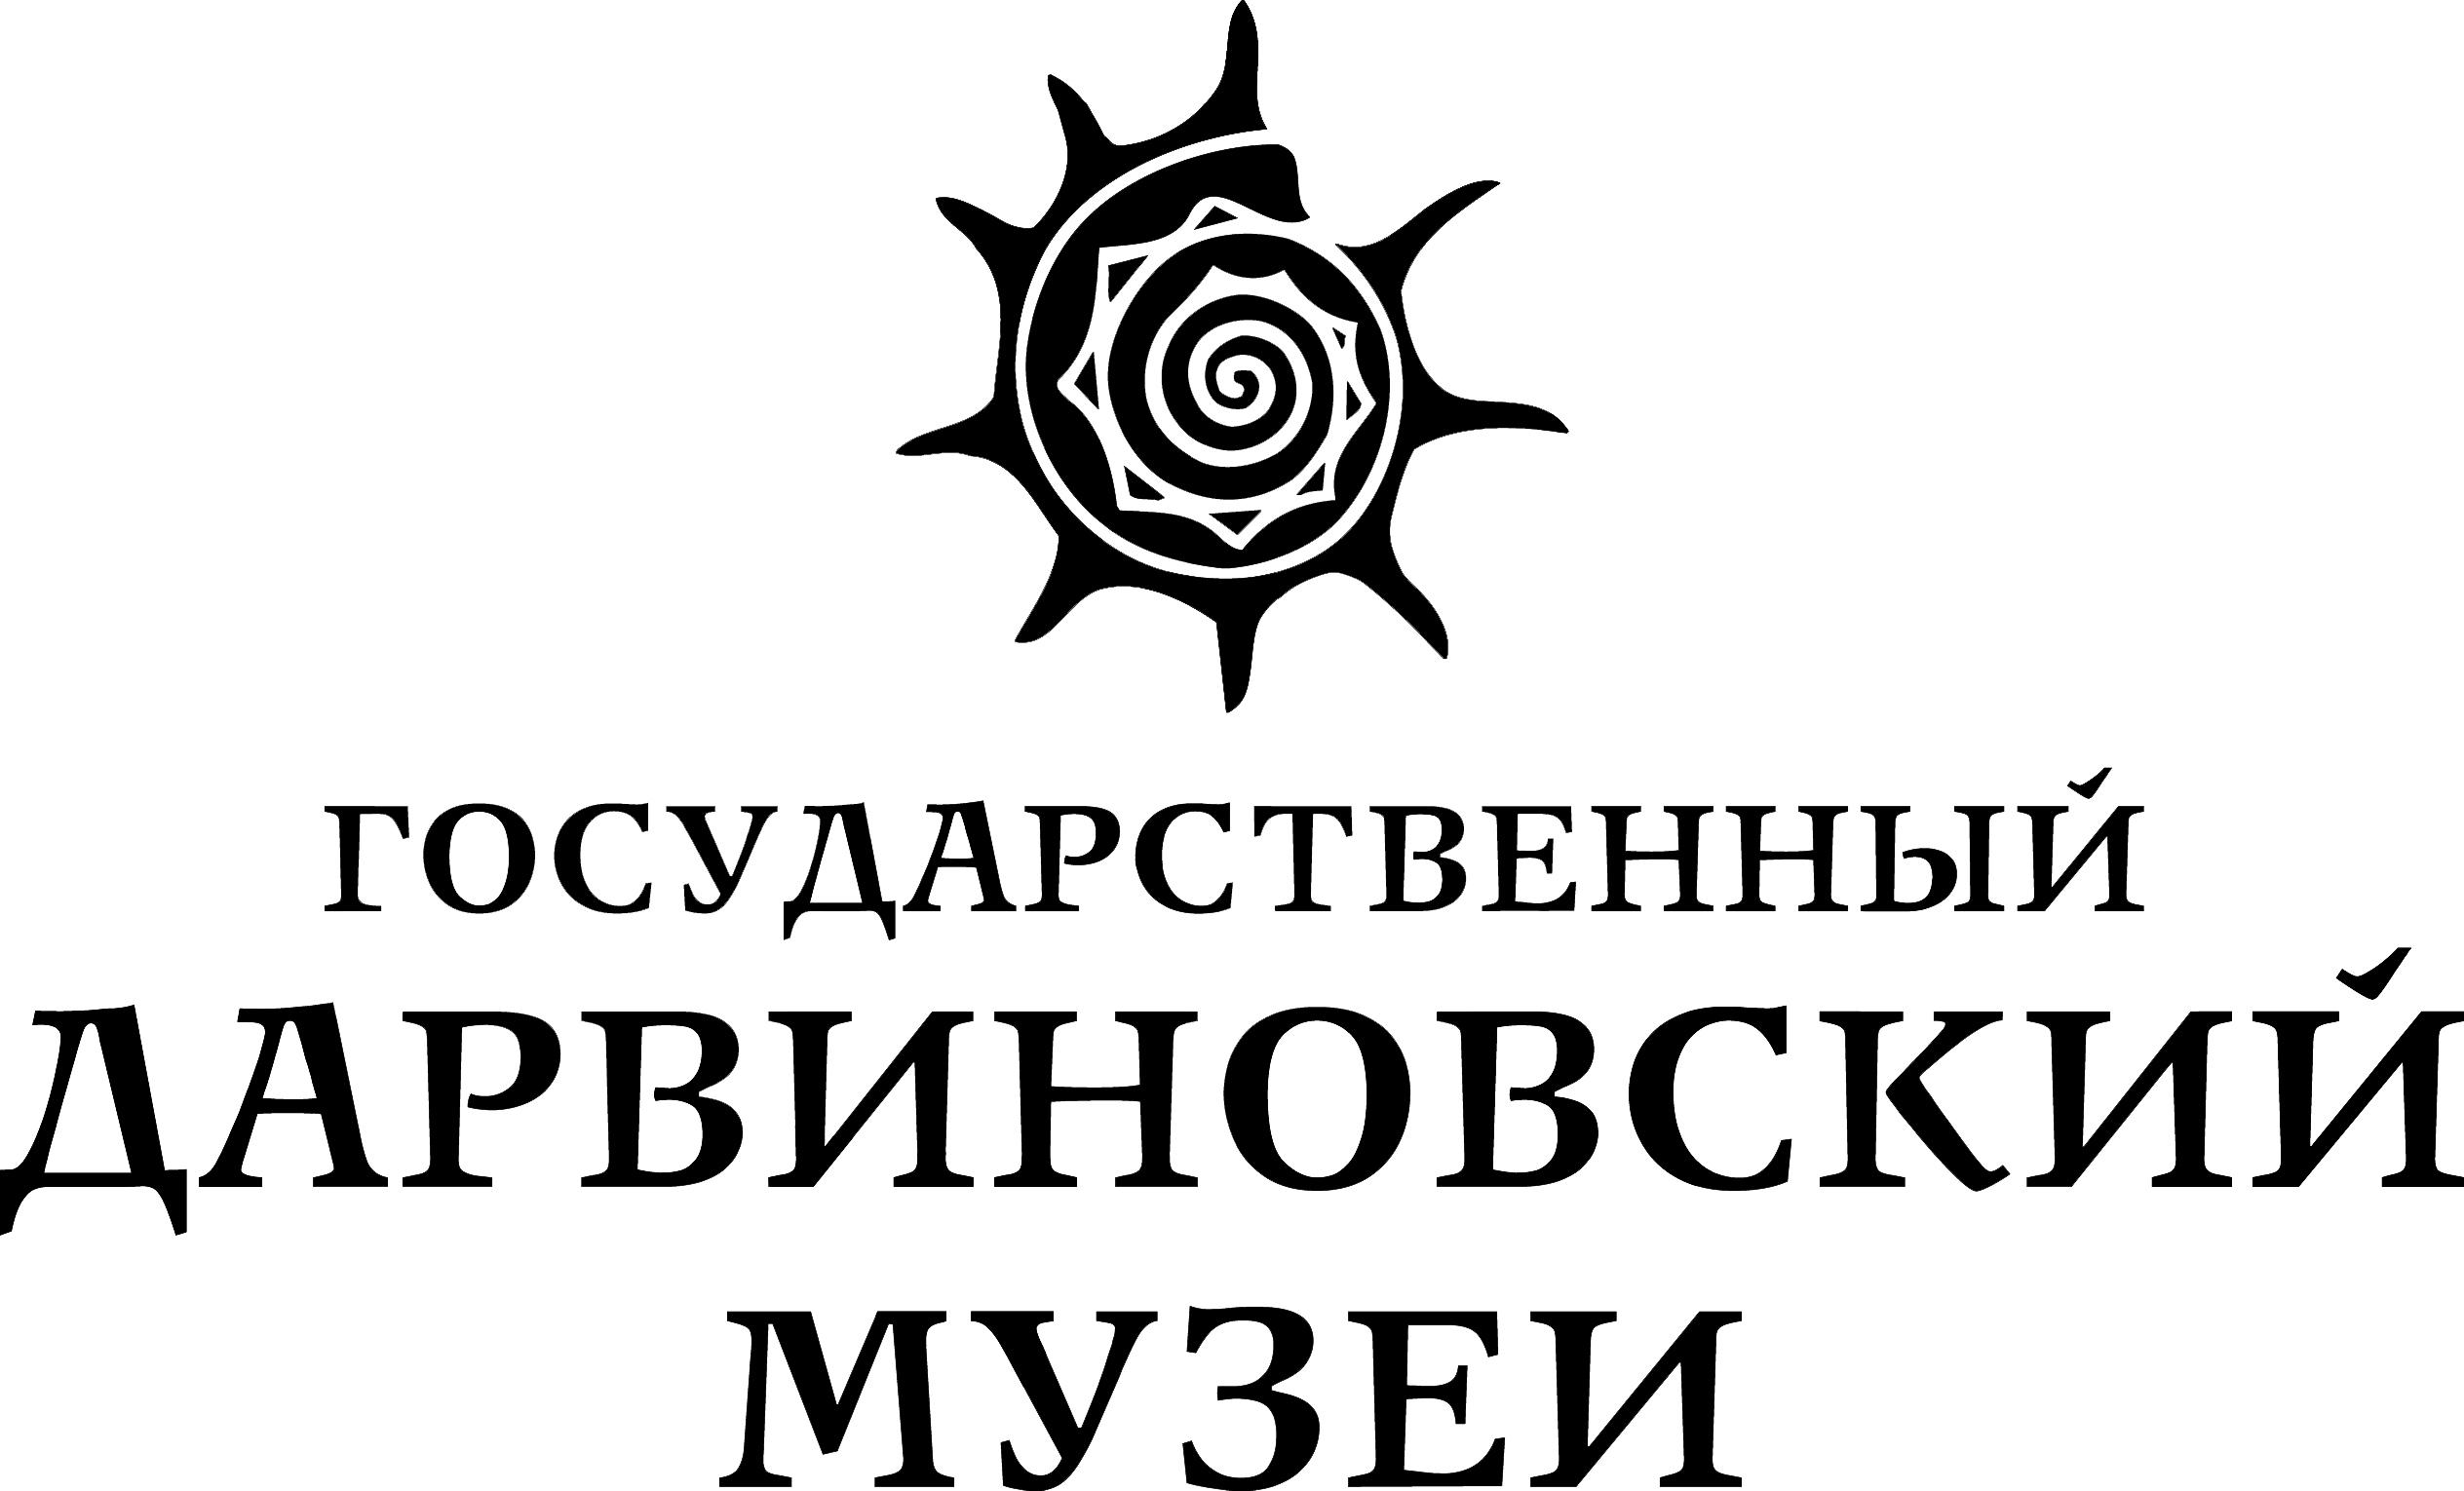 Dc566547dc